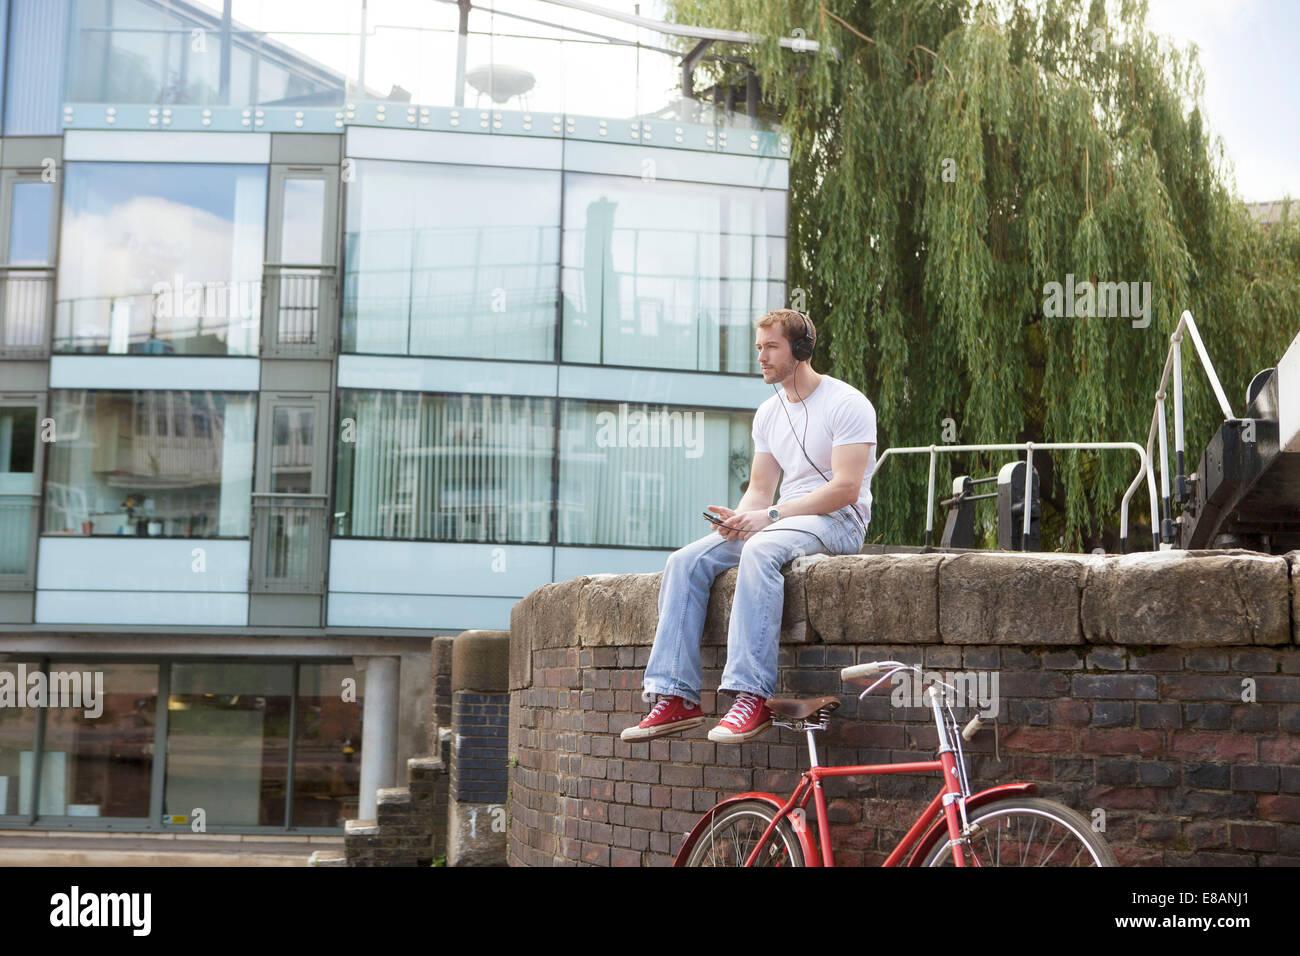 Menschen hören Musik von Canal, East London, UK Stockbild